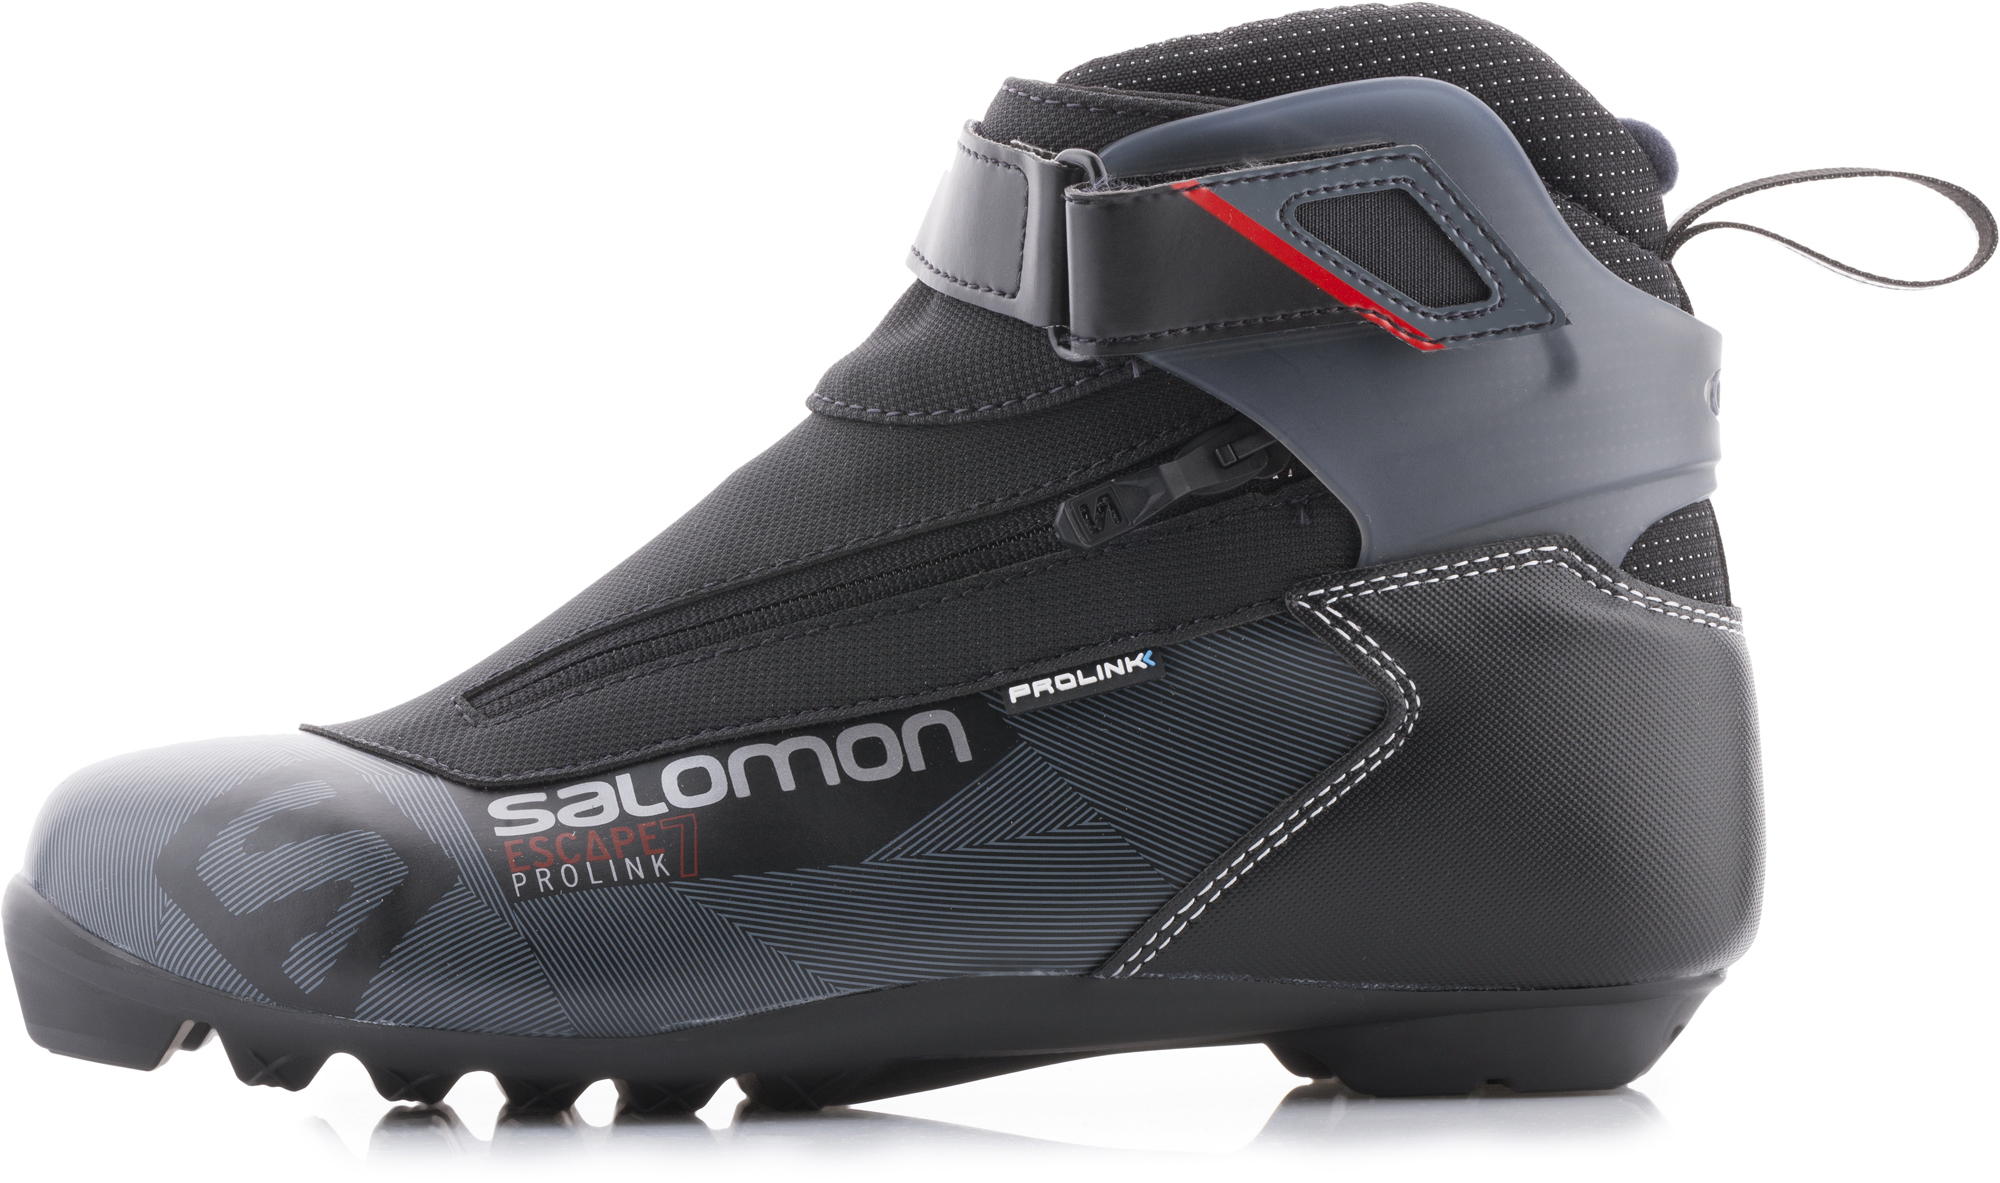 Salomon Ботинки для беговых лыж Salomon Escape 7 Prolink, размер 46,5 salomon крепления для лыж salomon prolink auto